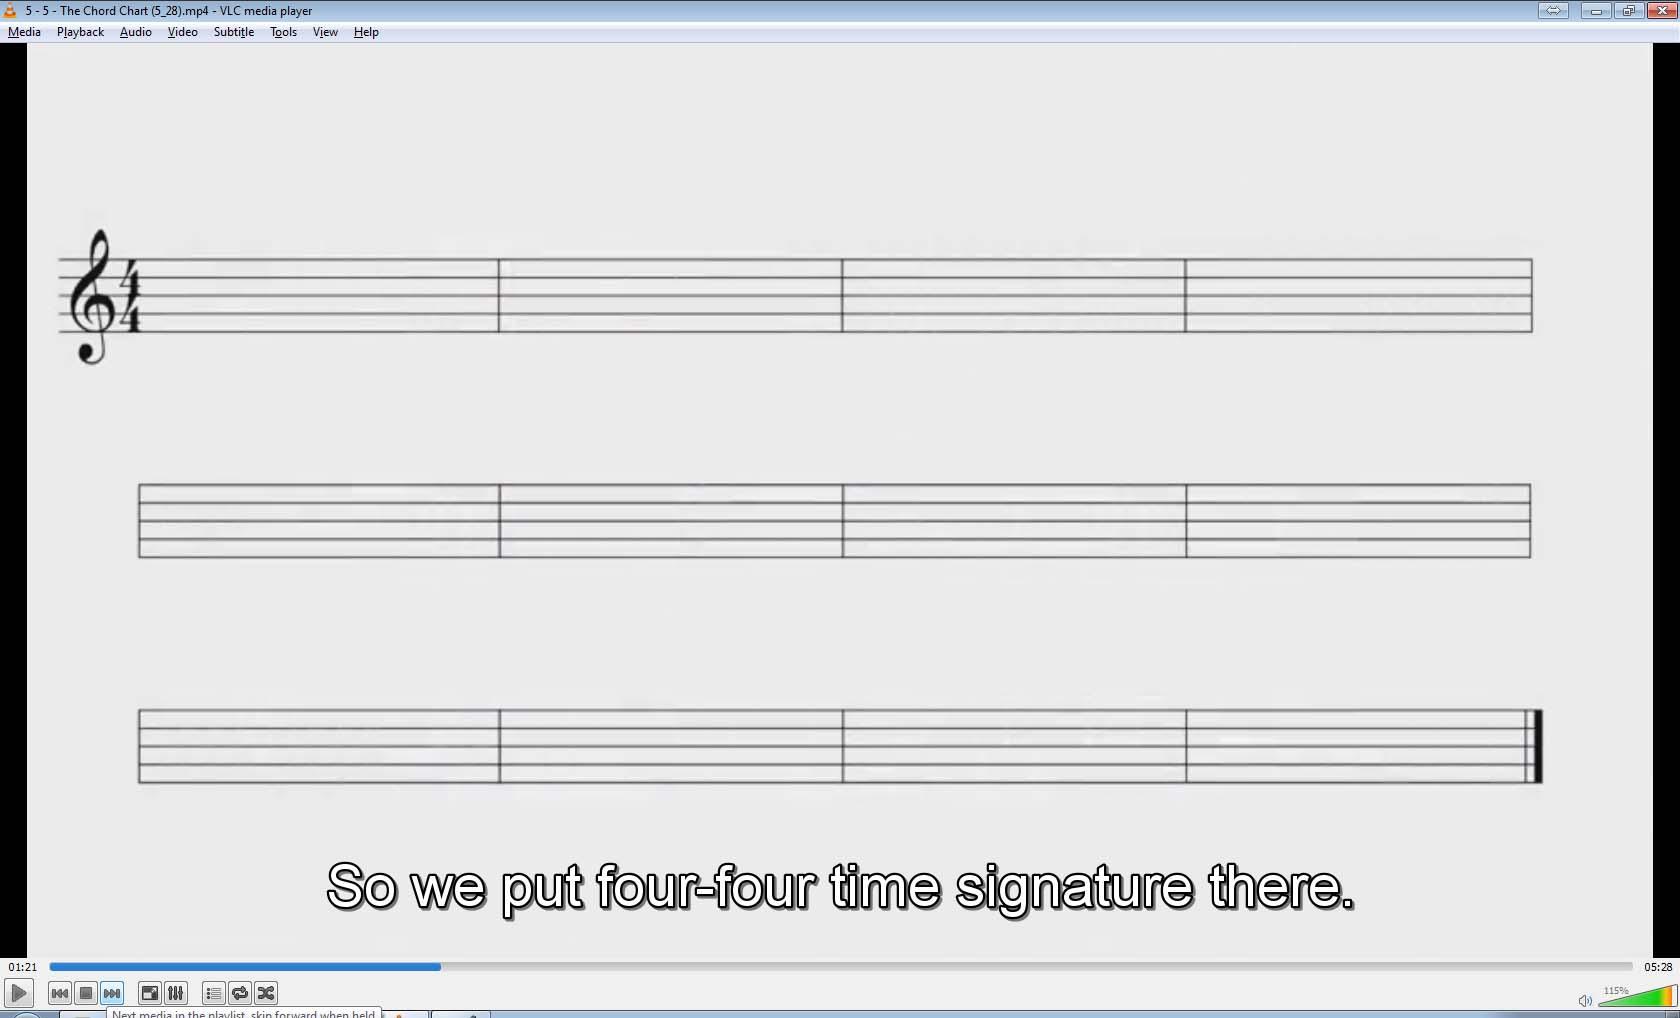 Coursera Dym Lesson 5 Videos 5